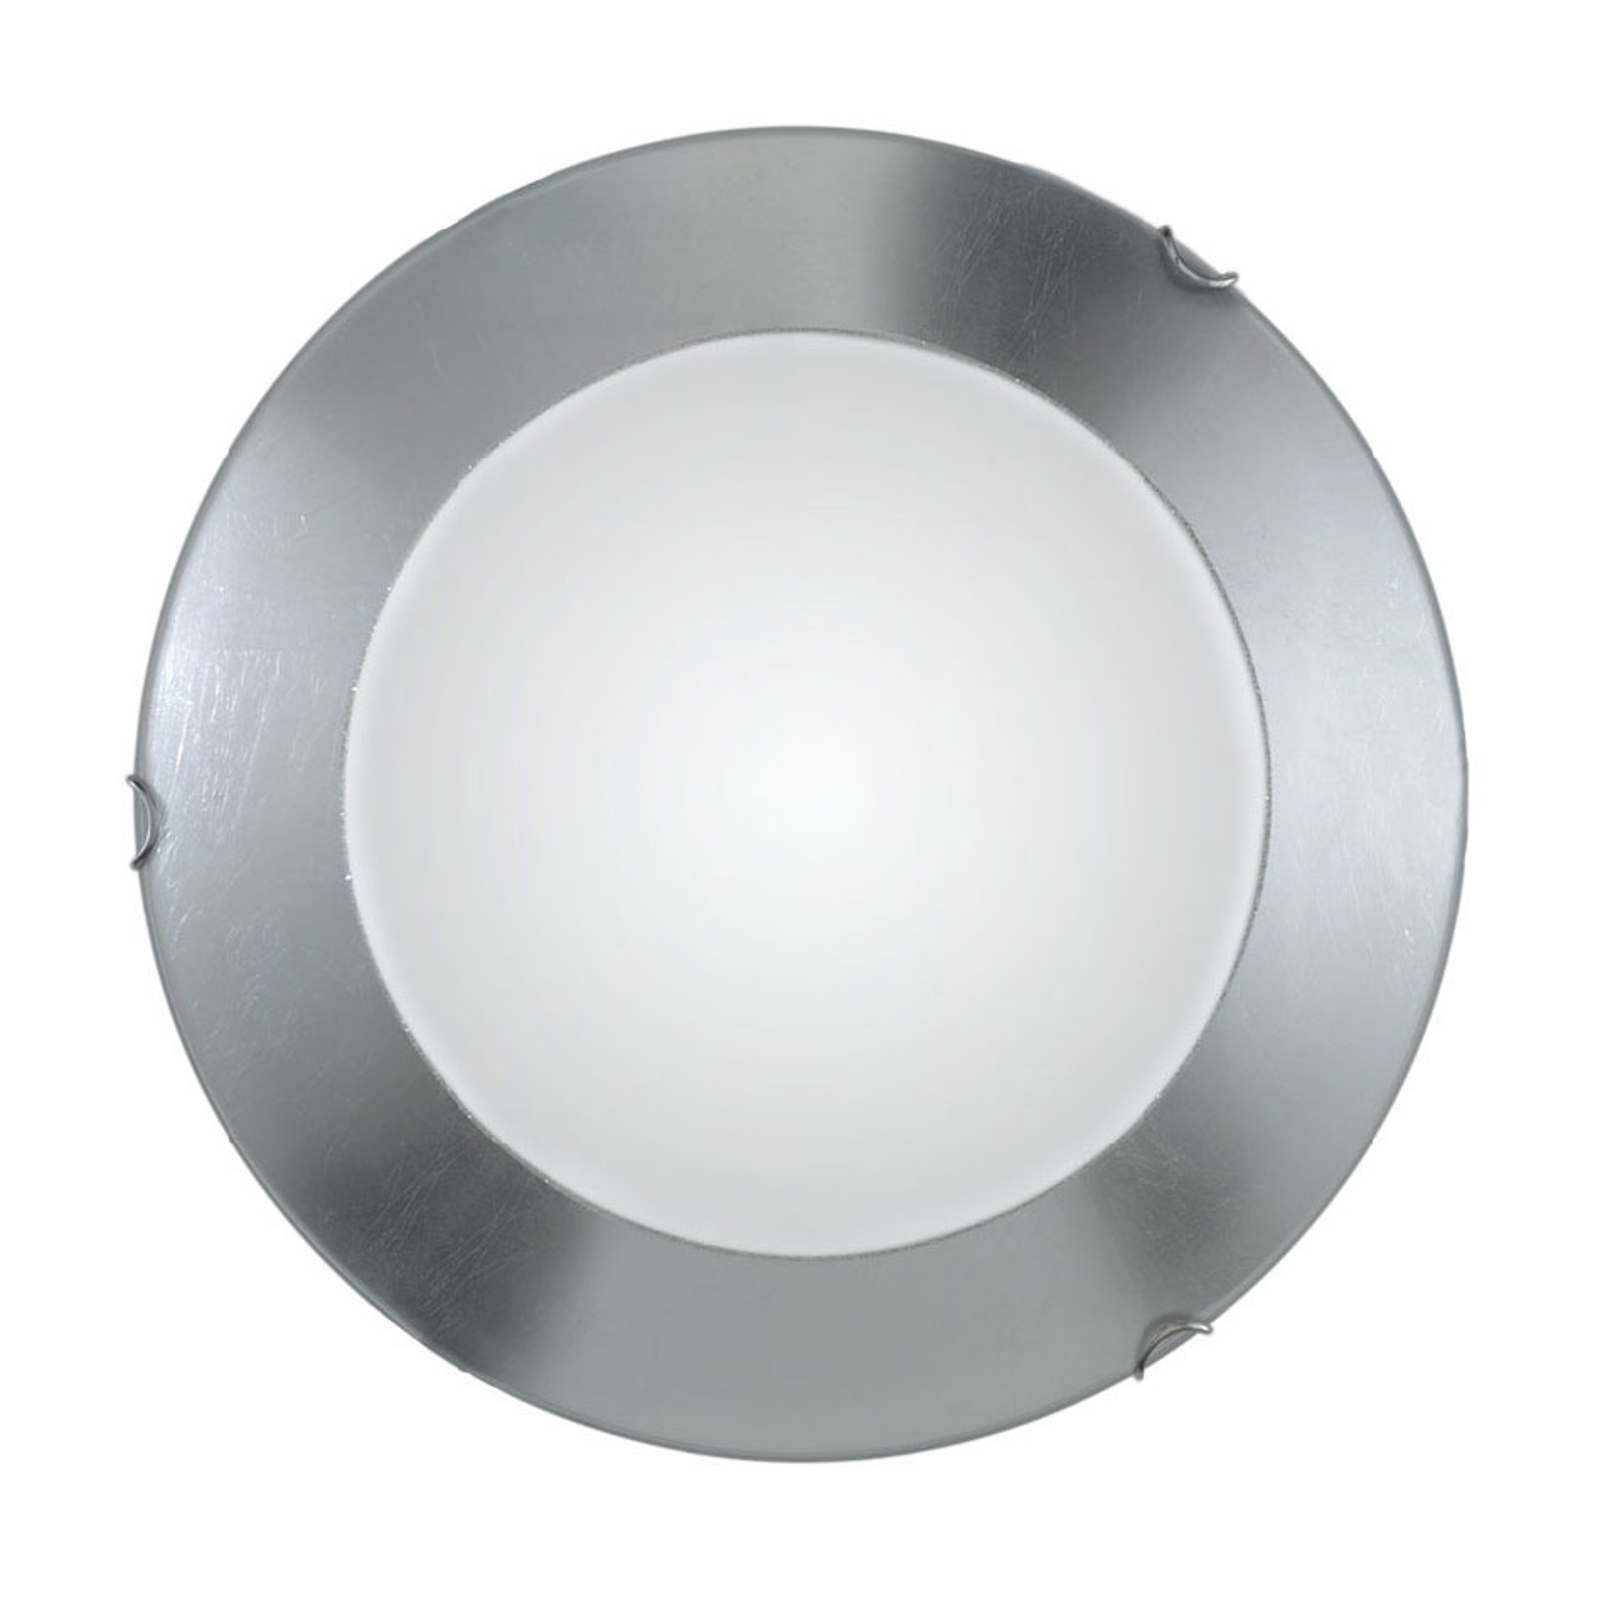 Lampa sufitowa Moon Leaf, srebrna, Ø 40 cm